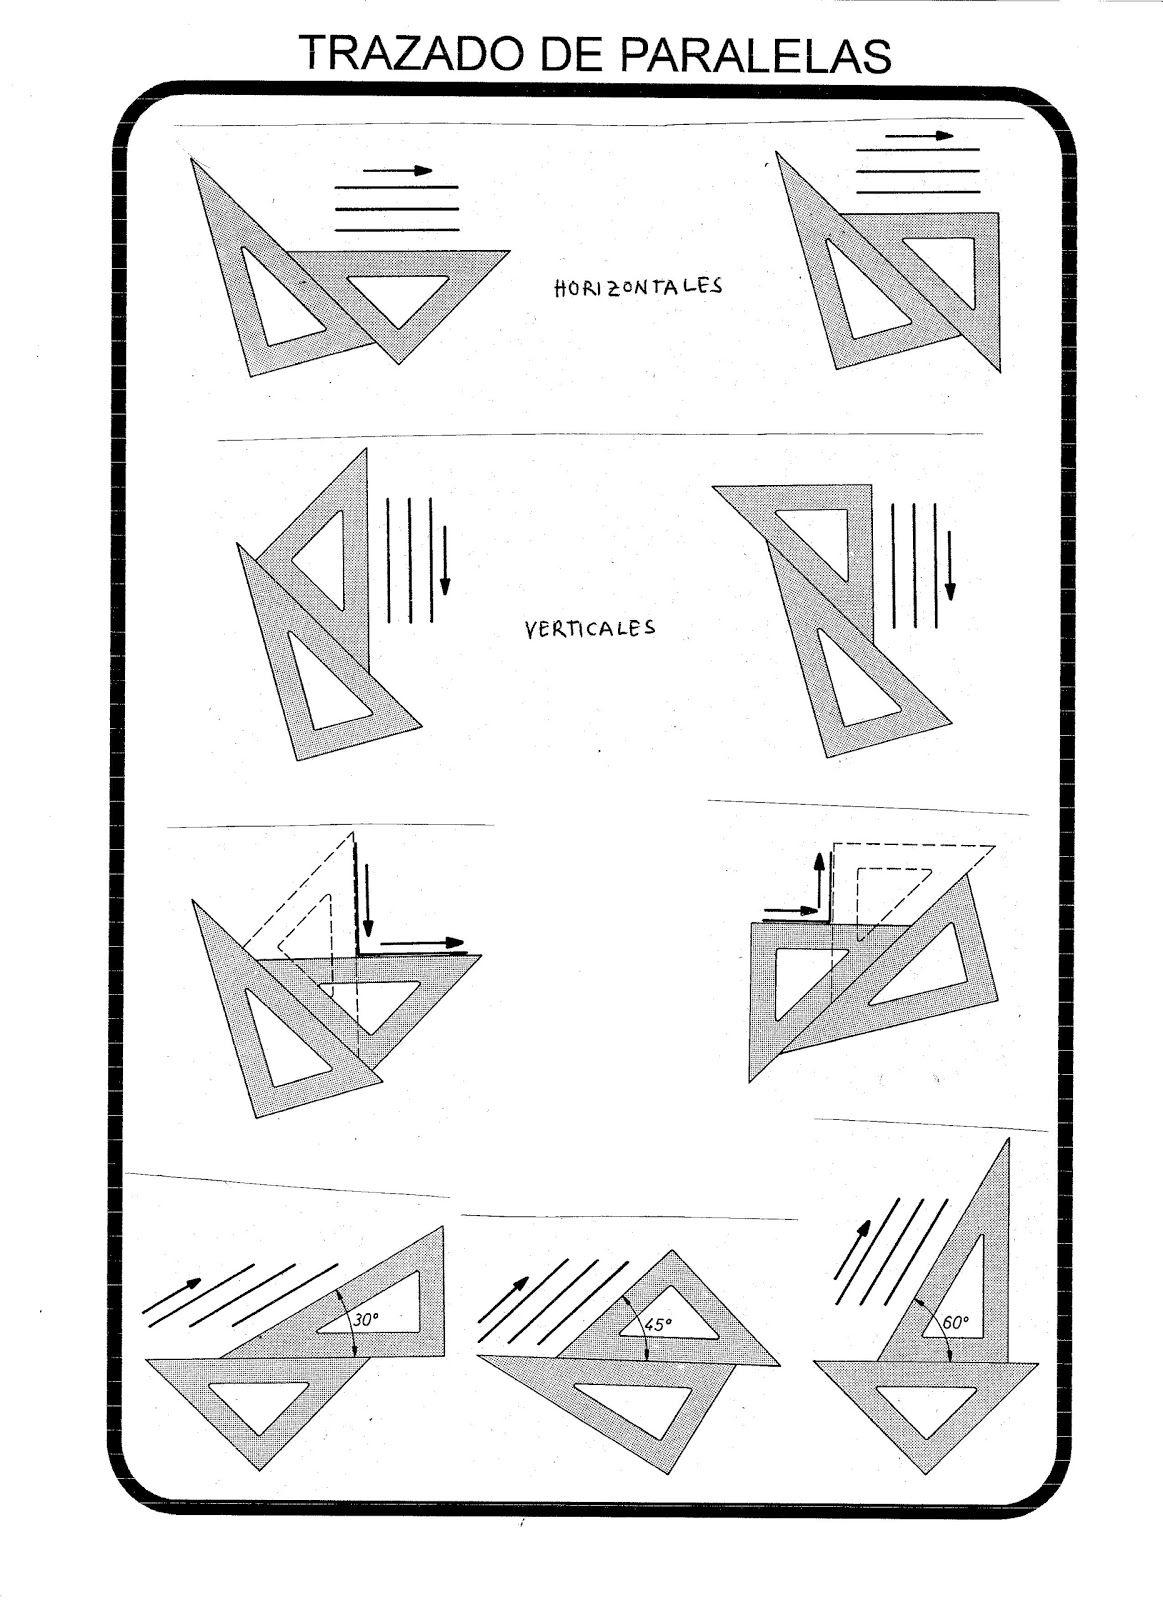 Drawing Parallel Lines Using Set Squares : º eso visual arts plástica bilingüe dibujo arcas